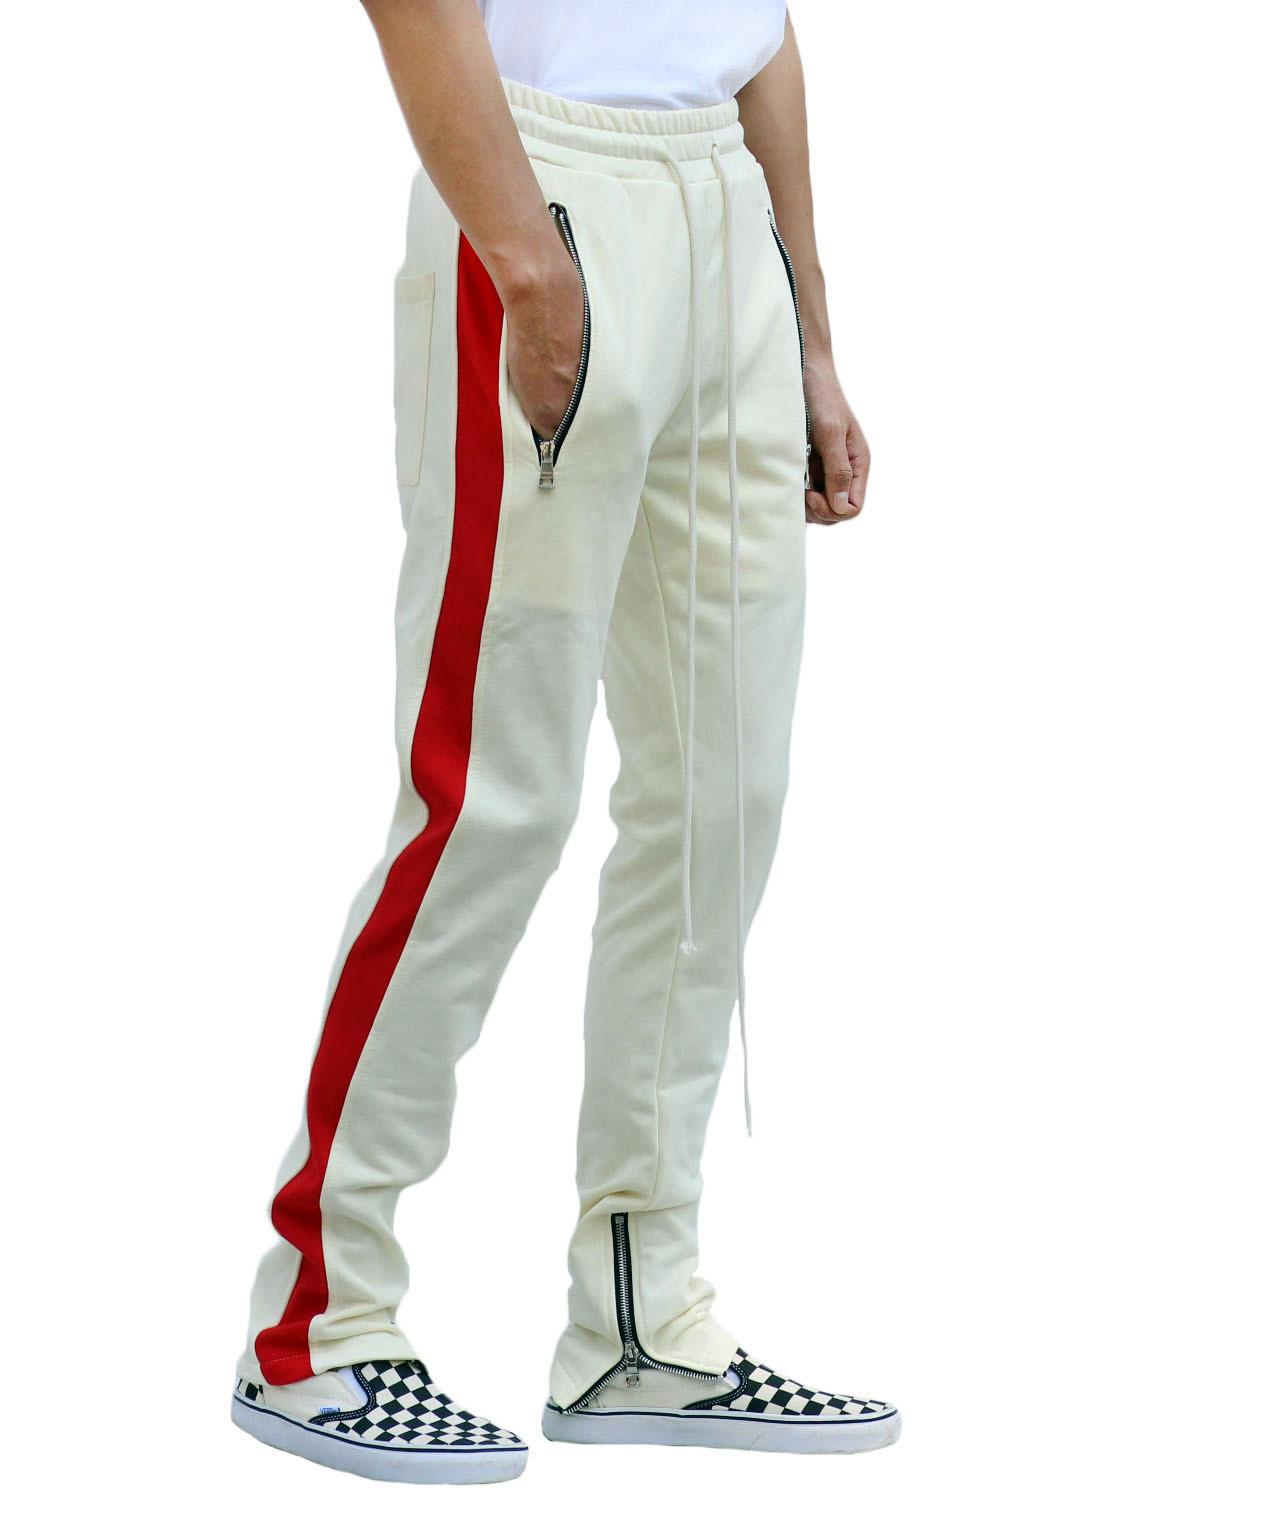 Beige Track Pants - Red Stripe